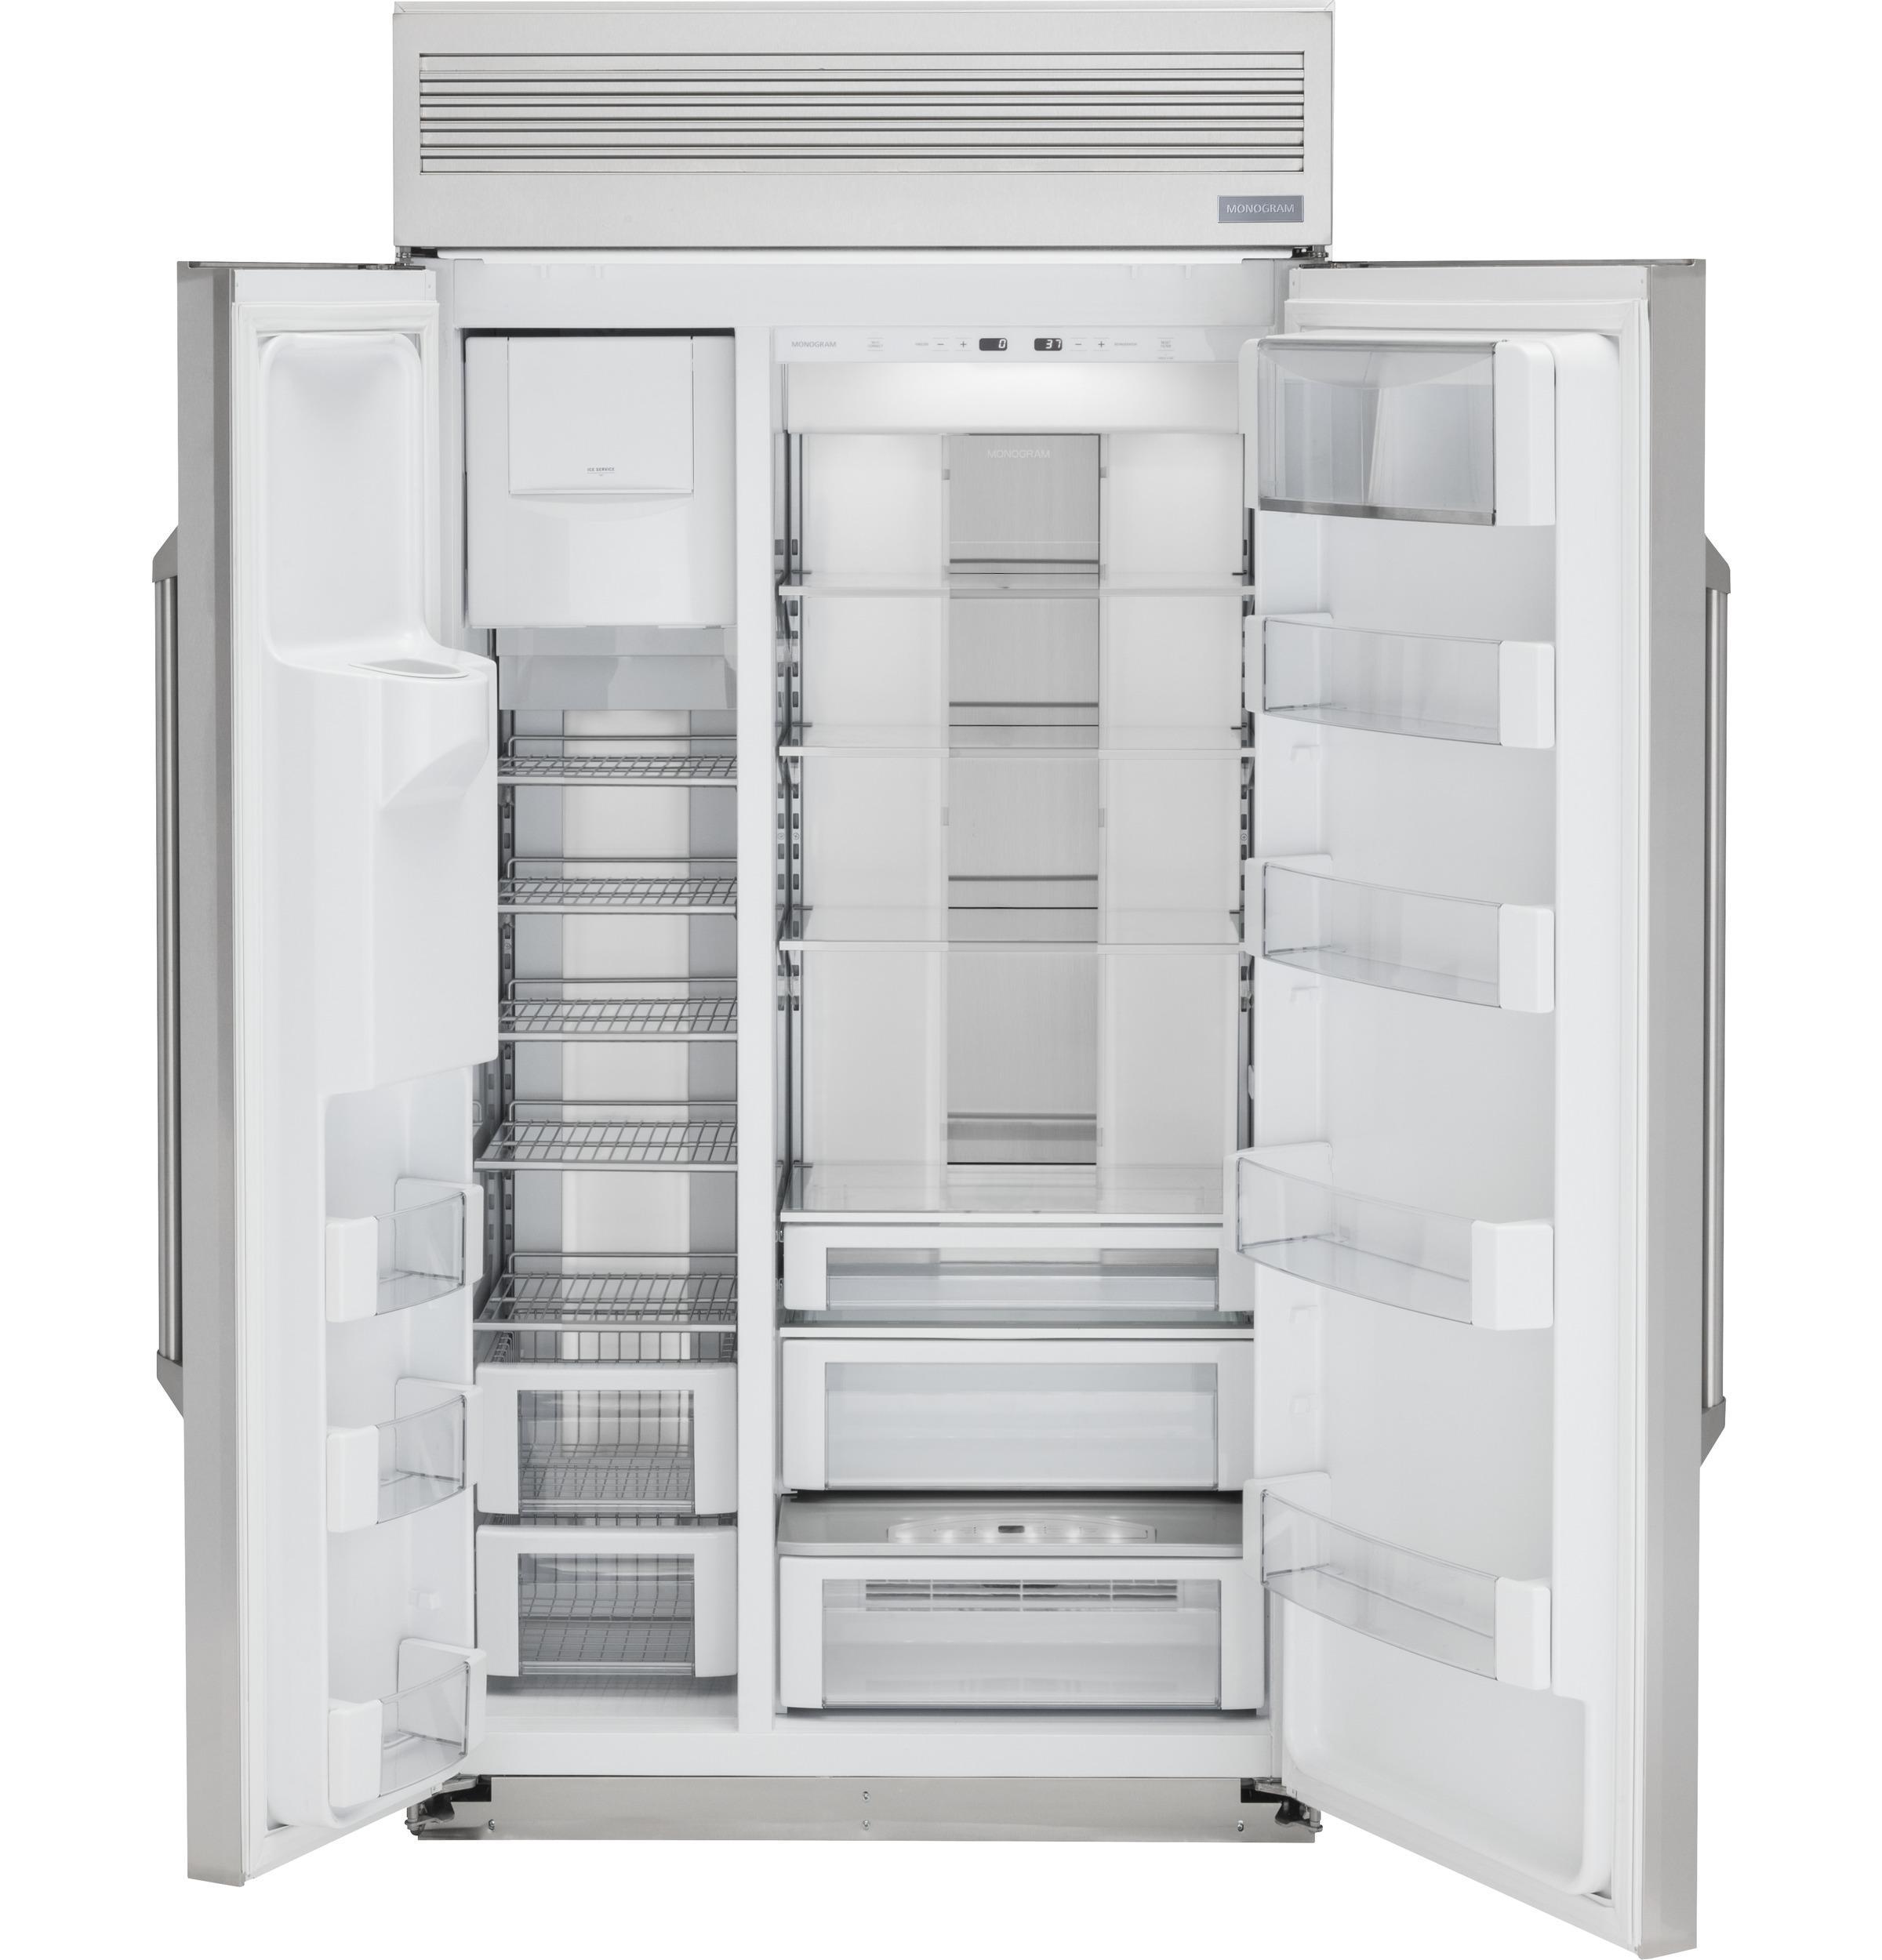 ge monogram refrigerator parts diagram ceiling fan wiring diagrams zisp480dkss